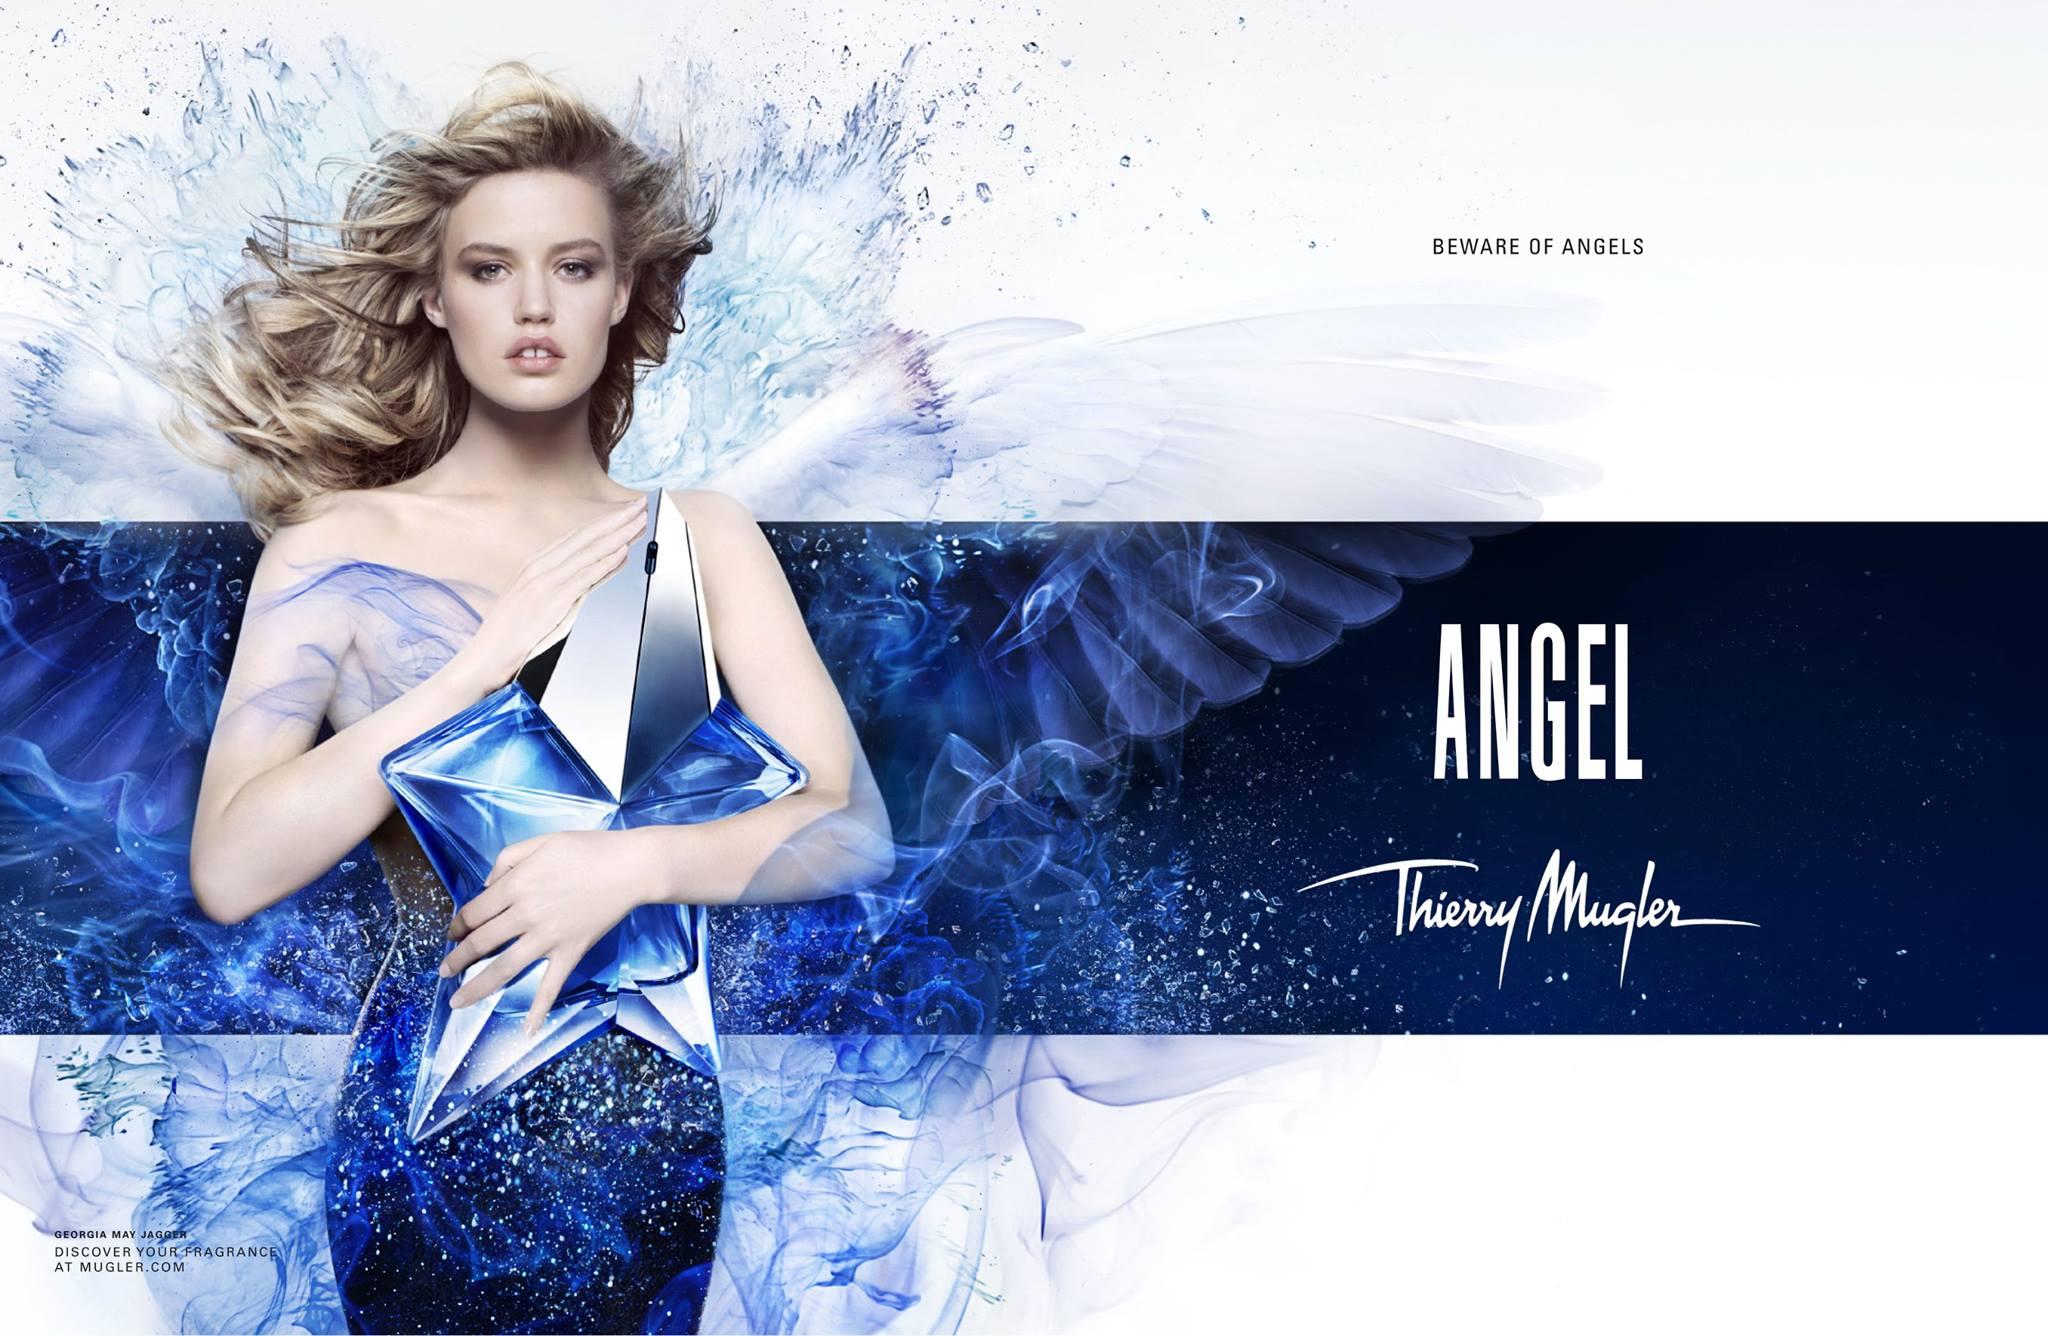 thierry-muglers-perfume-angel-perfume-angel-print-361902-adeevee